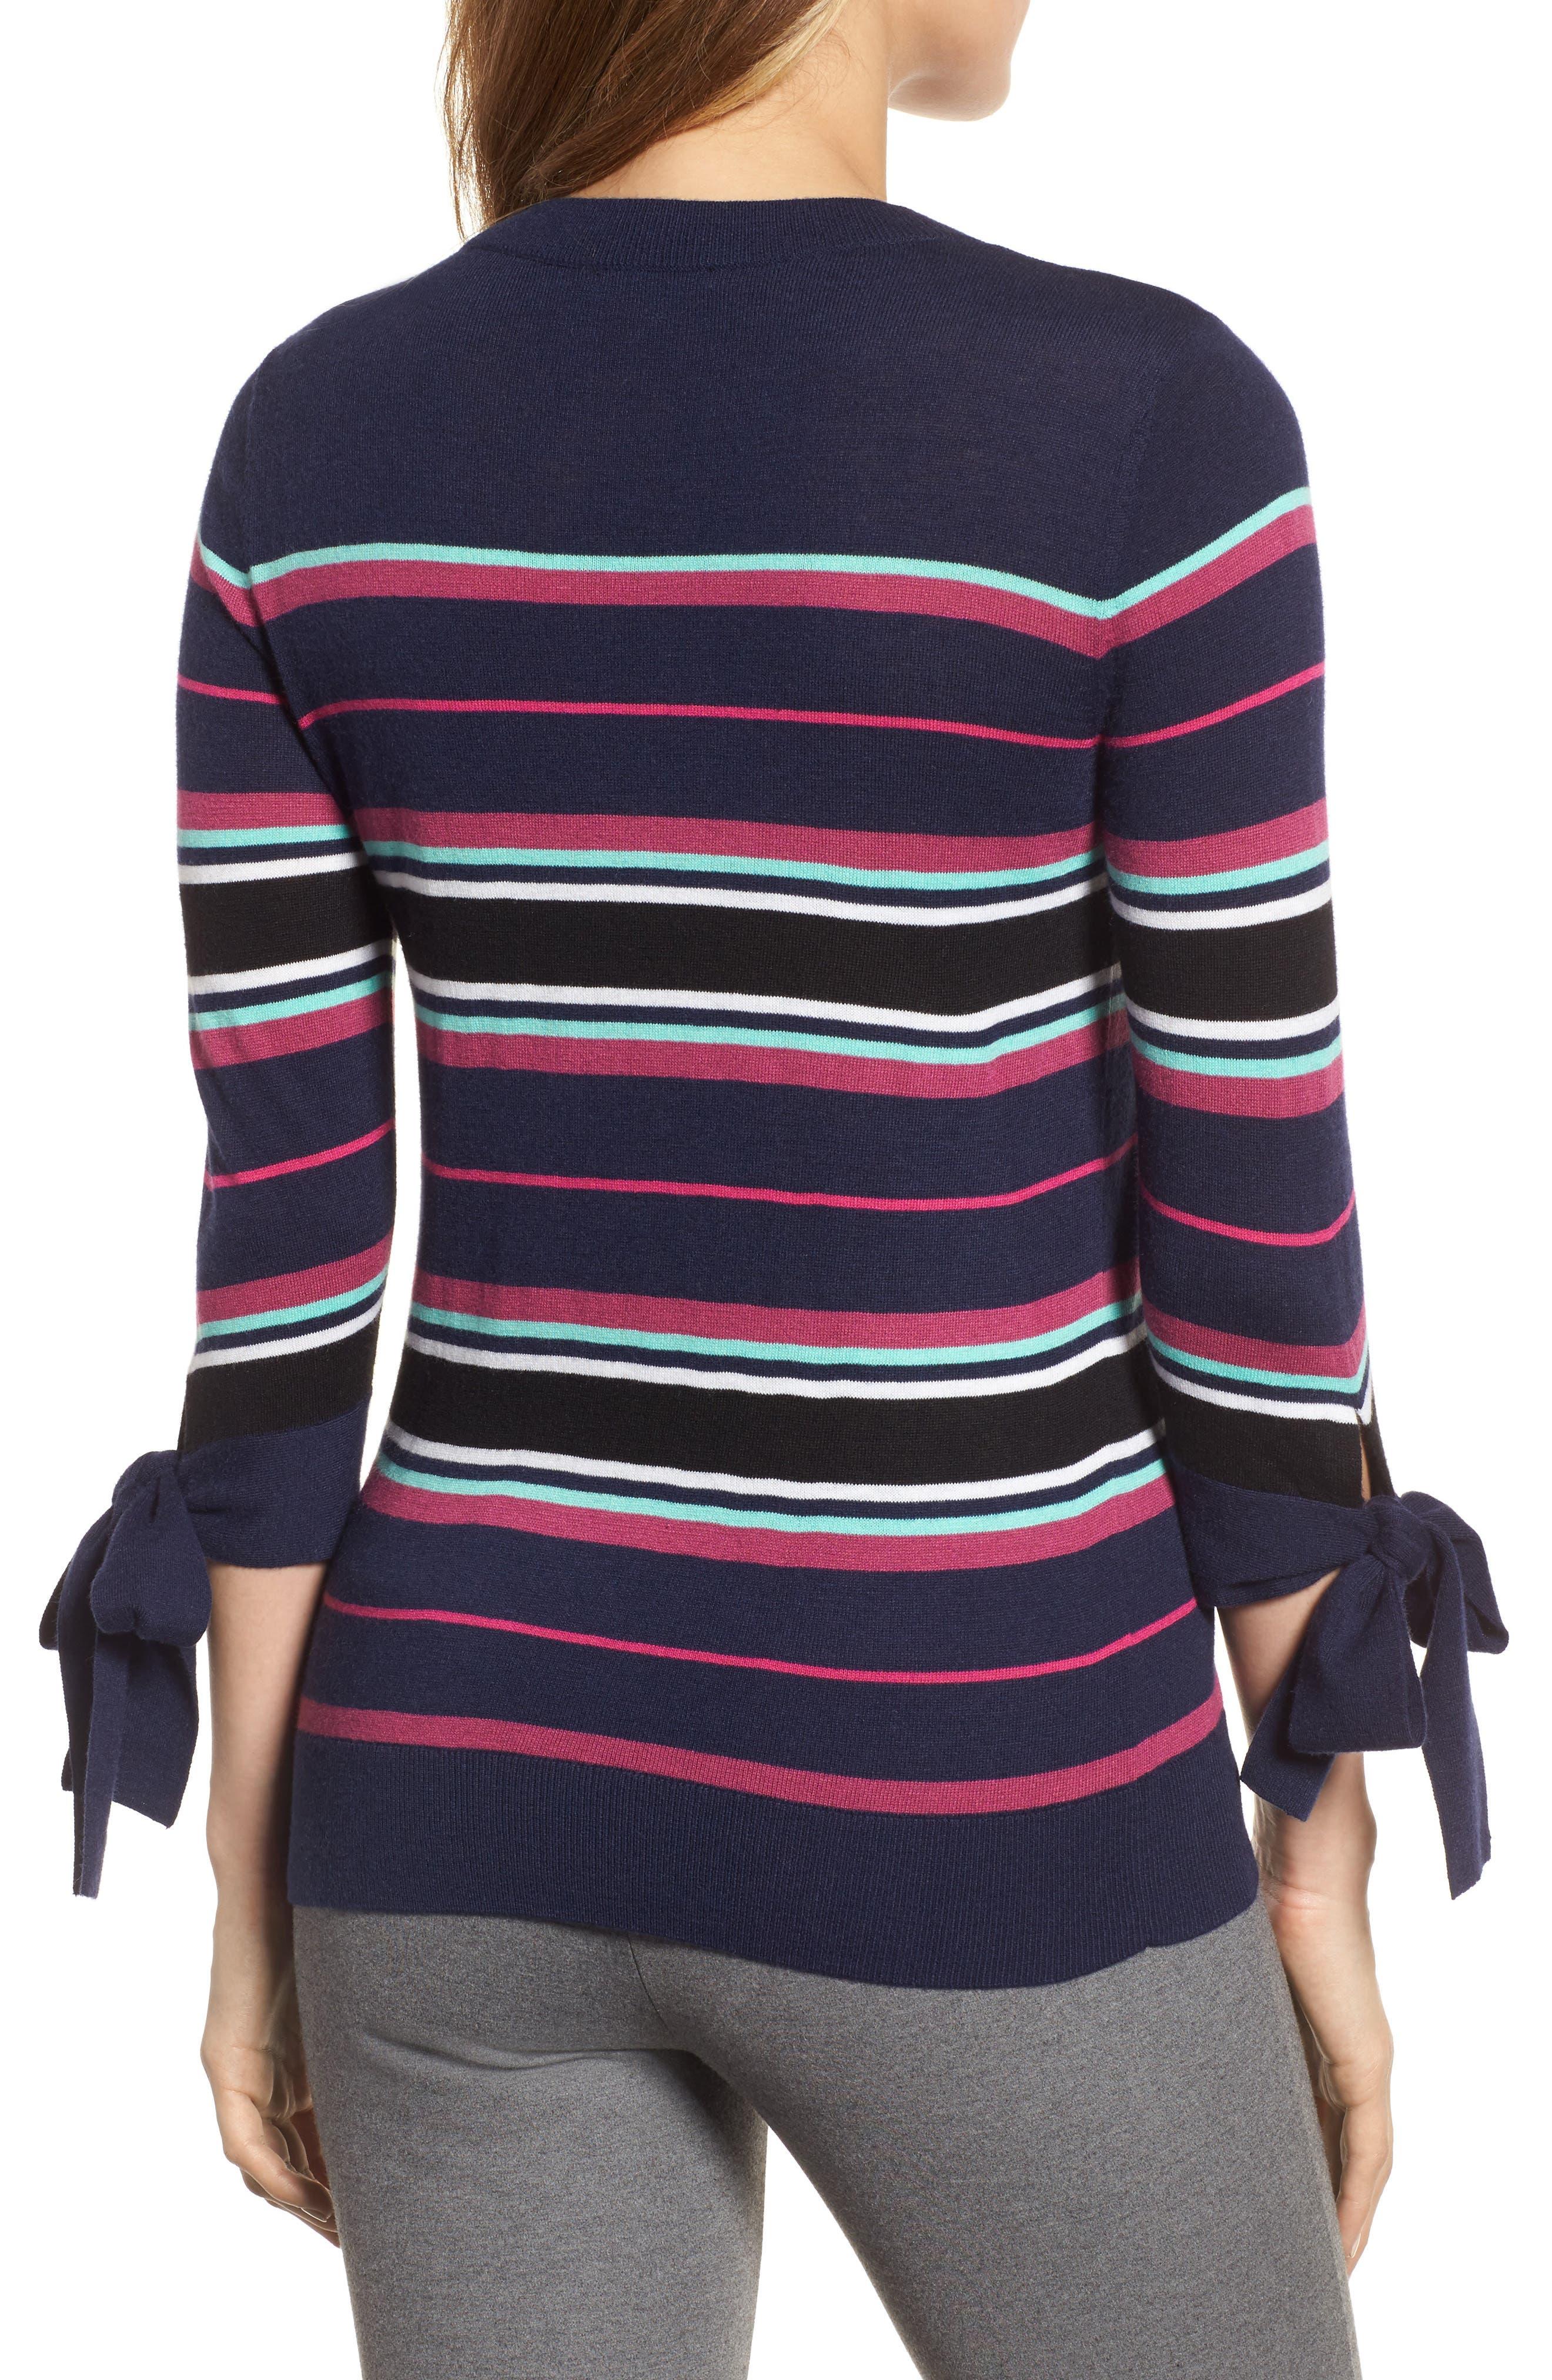 Tie Sleeve Crewneck Sweater,                             Alternate thumbnail 2, color,                             Navy/ Pink Multi Stripe